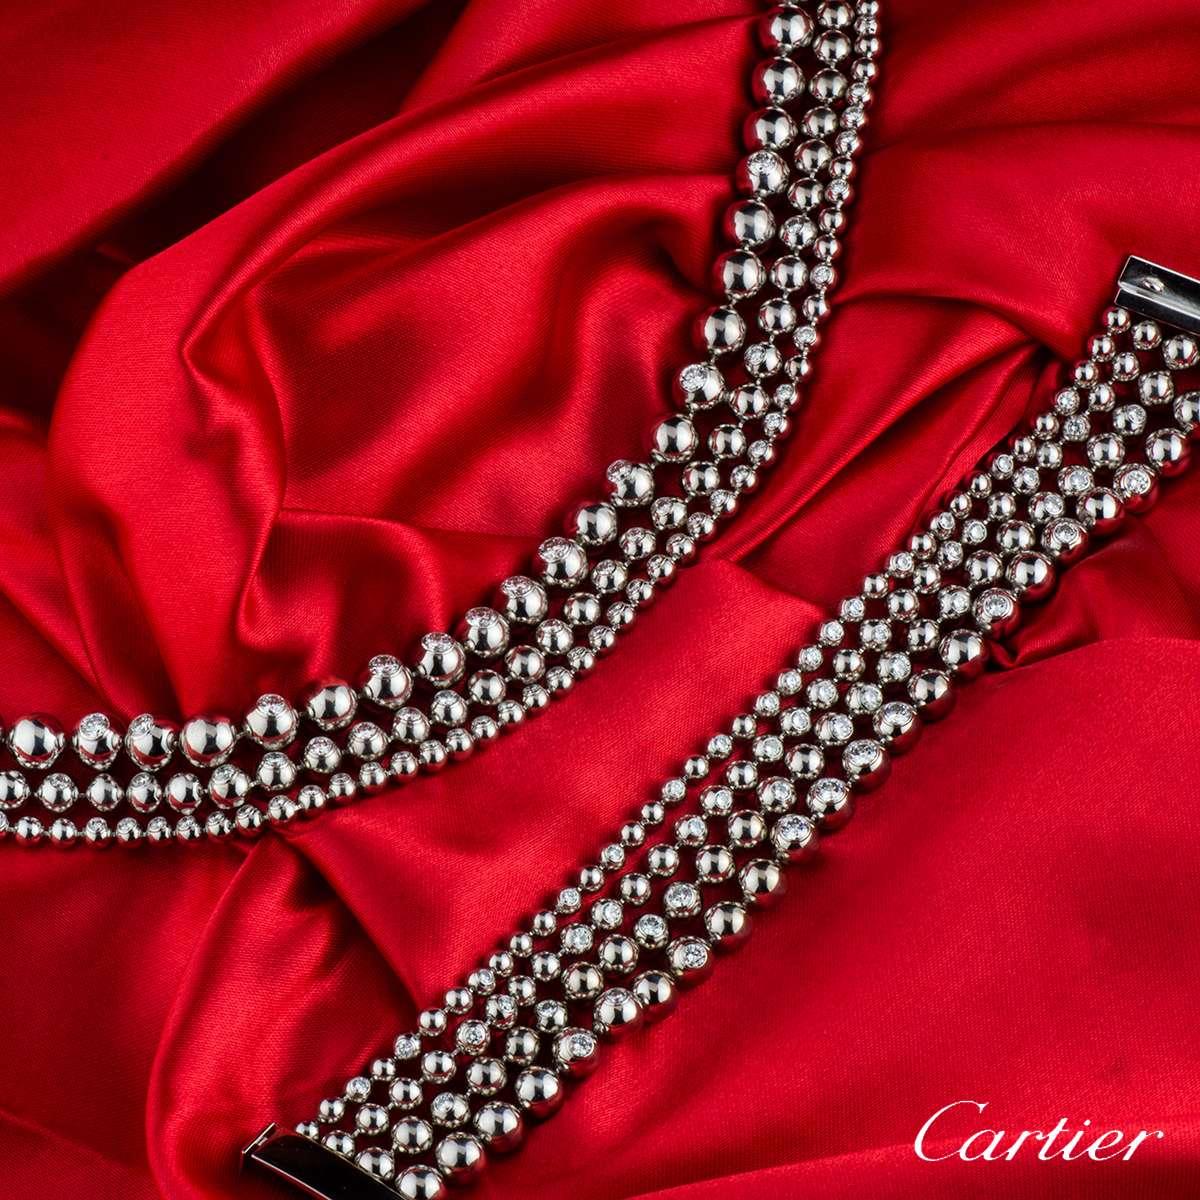 Cartier White Gold Diamond Moonlight Jewellery Suite